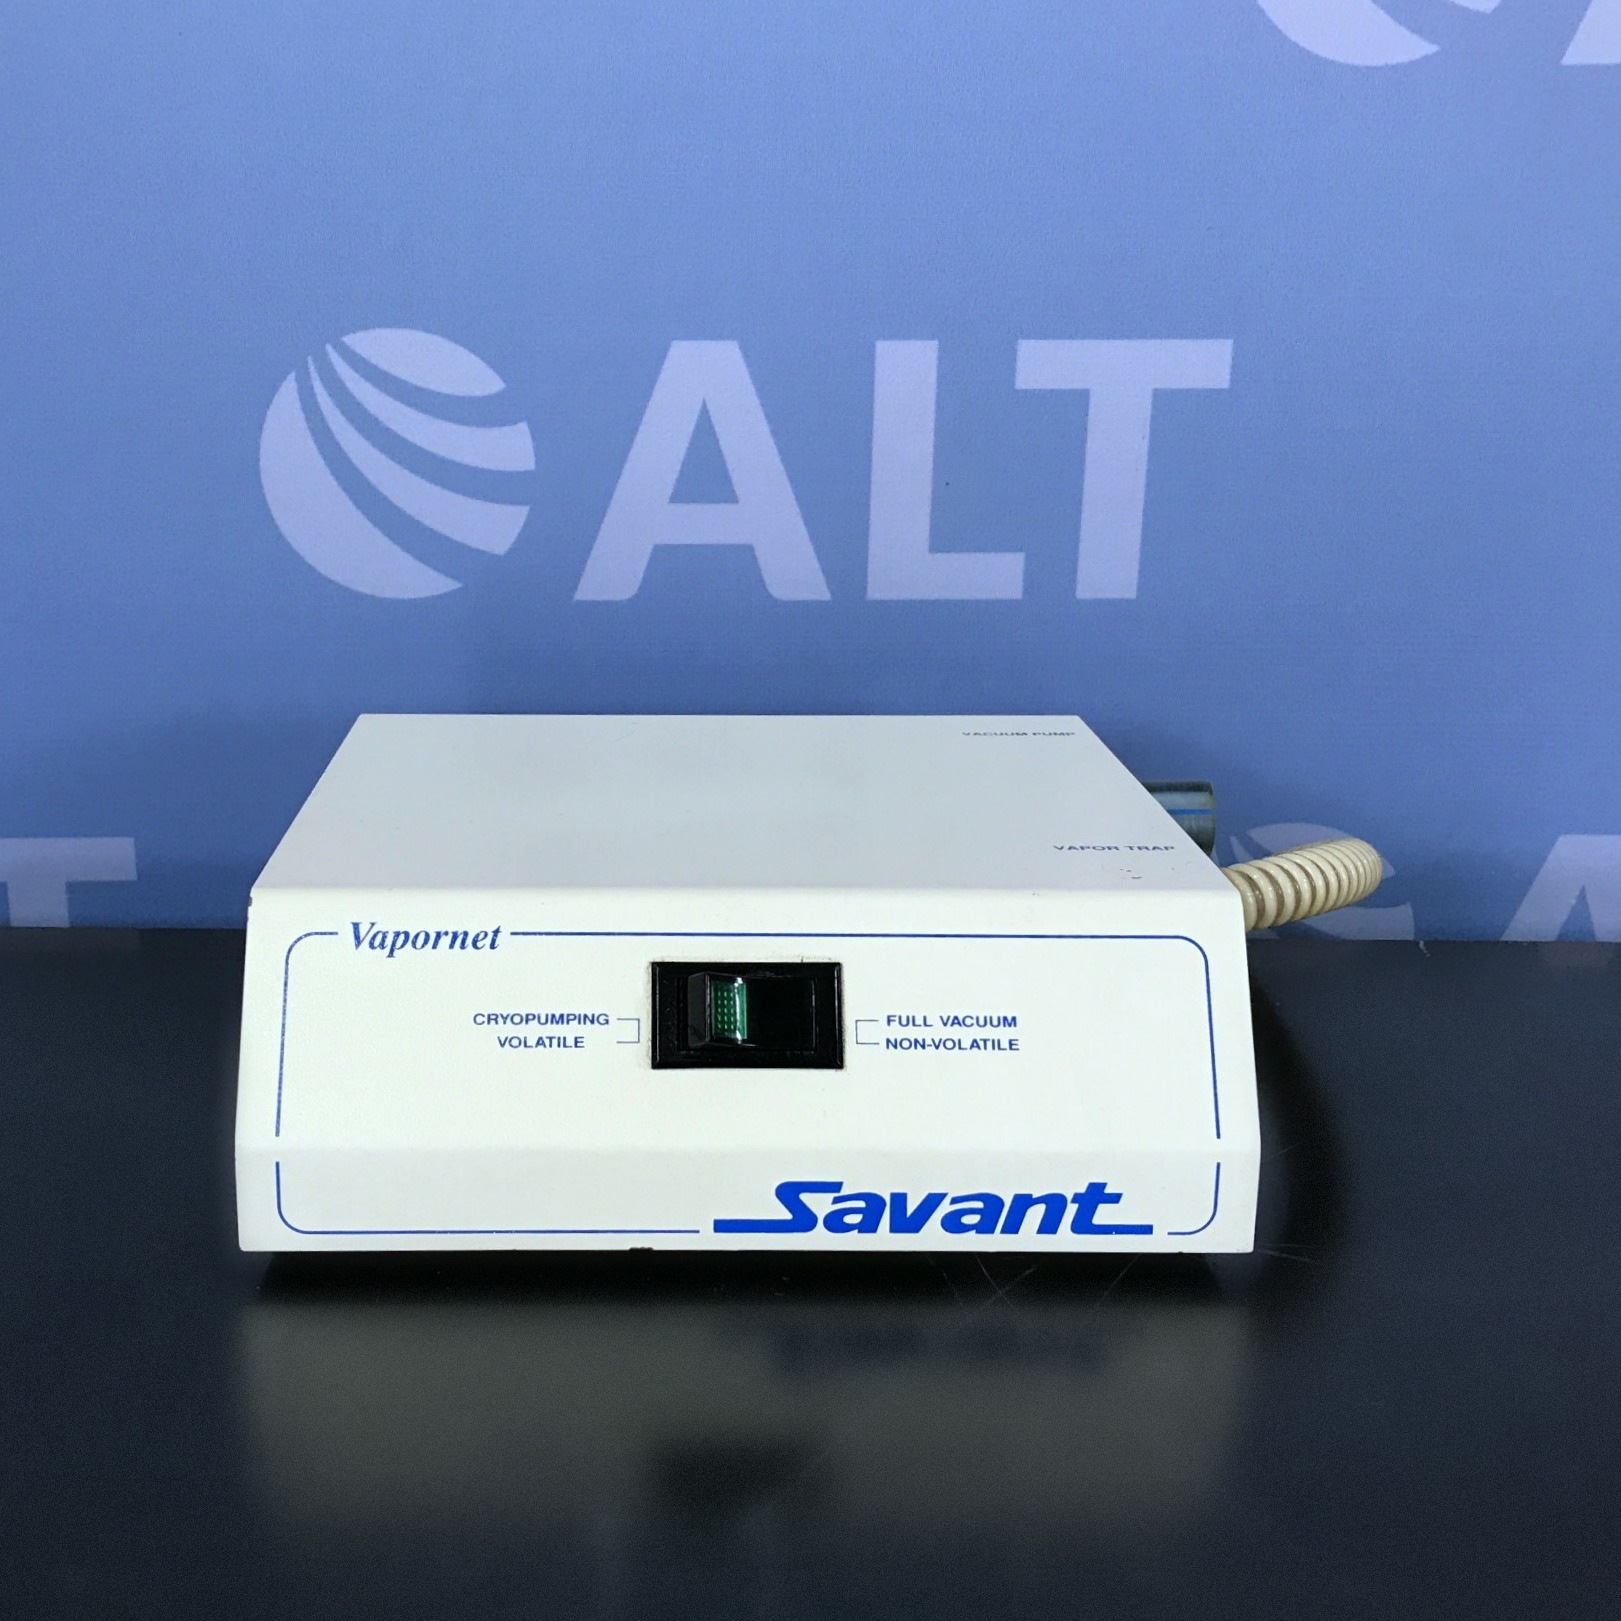 Thermo / Savant Vapornet Vacuum Controller Image